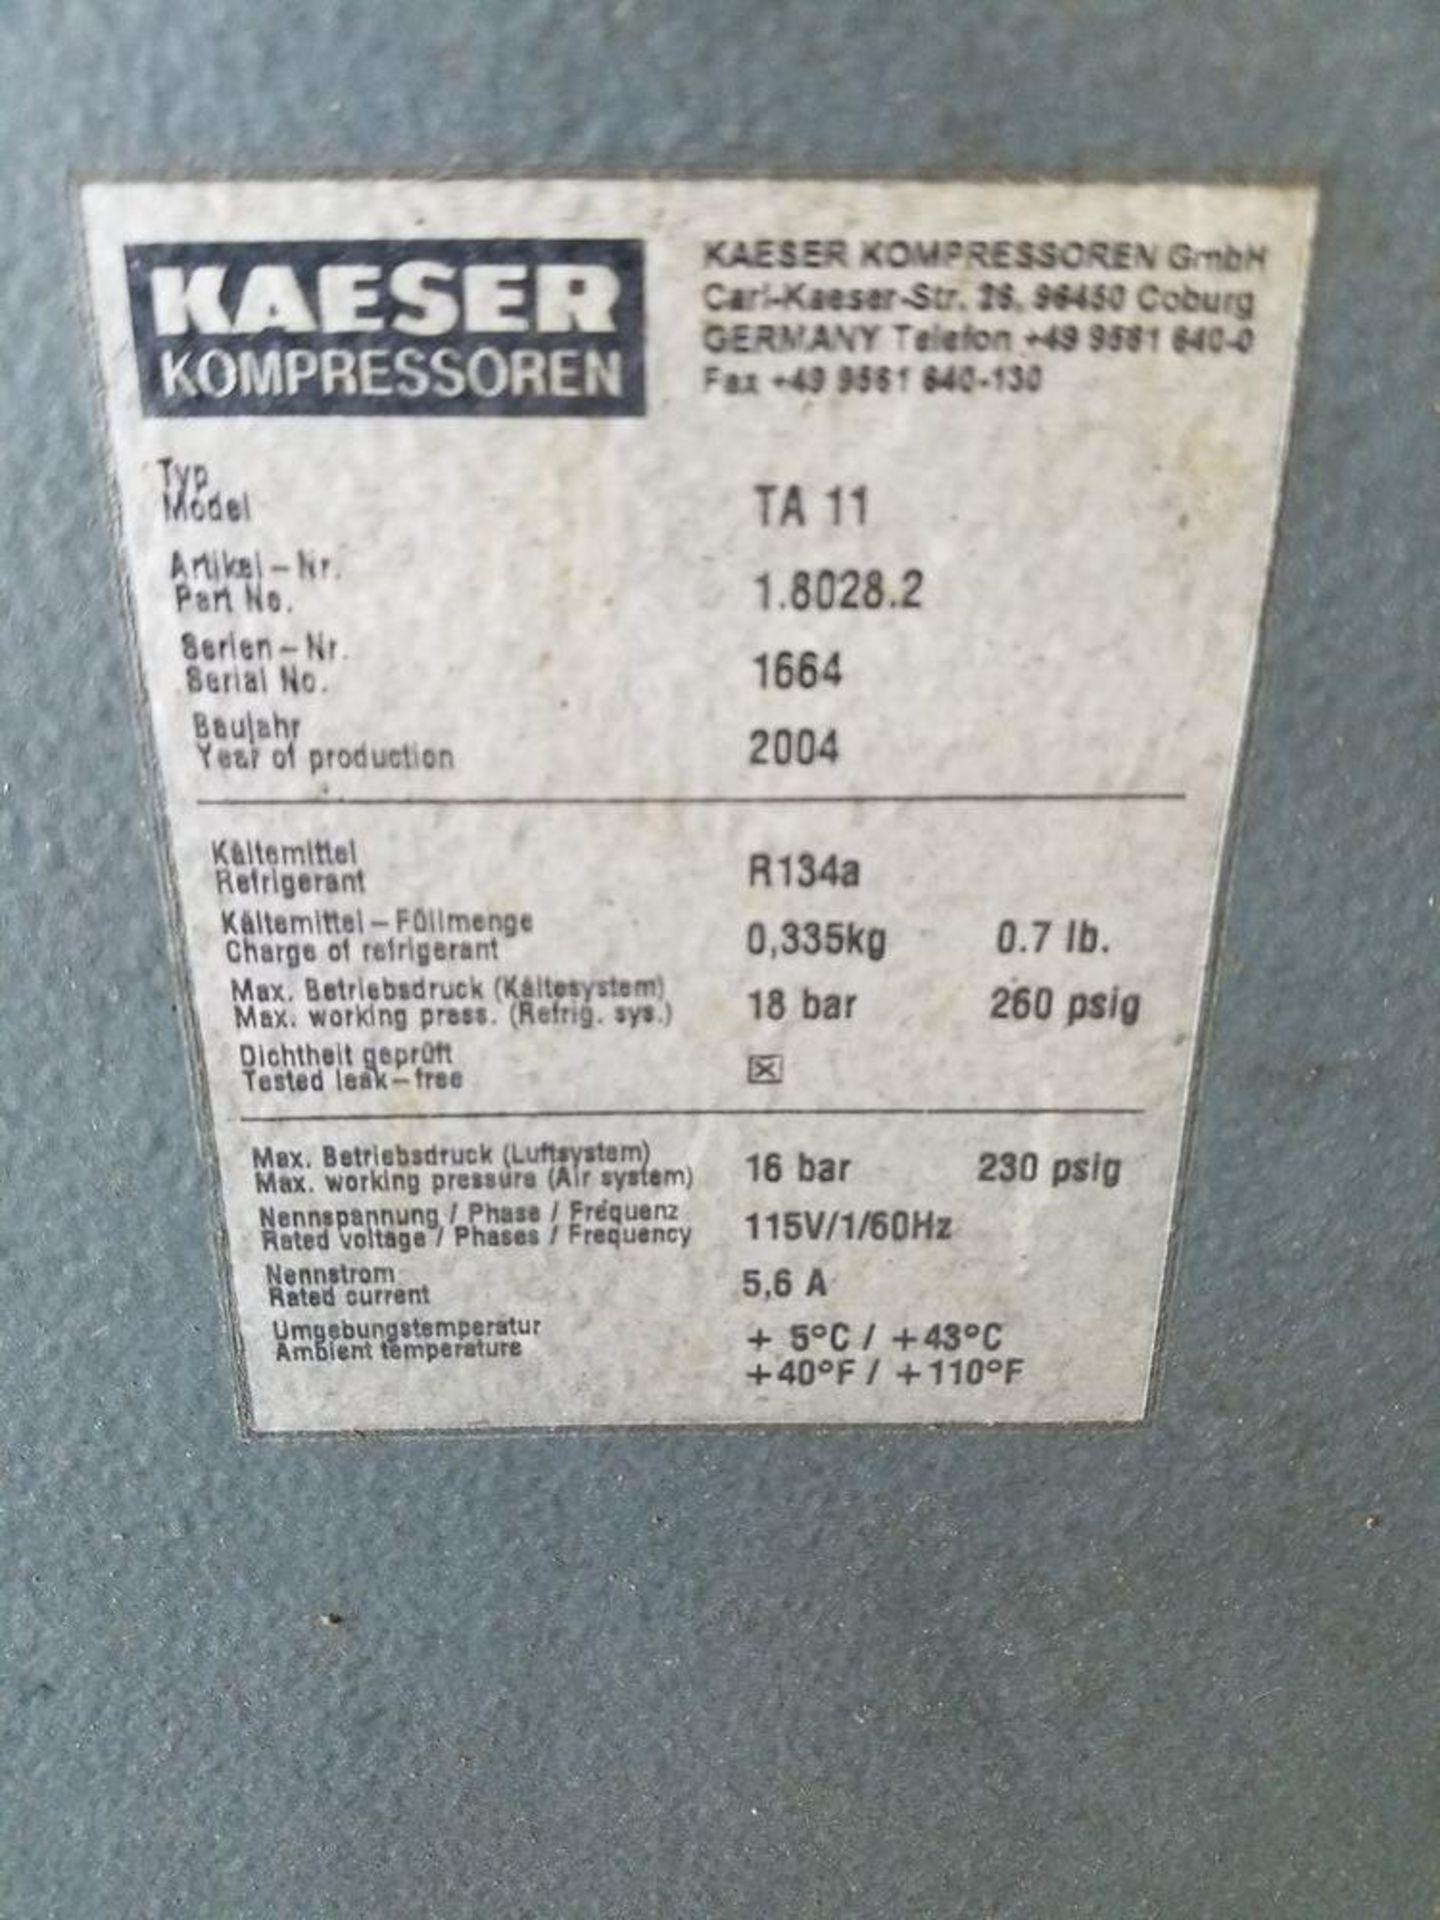 (2005) Kaeser mod. TA-11 and SMII, 10hp Rotary Screen Air Compressor - Image 4 of 4